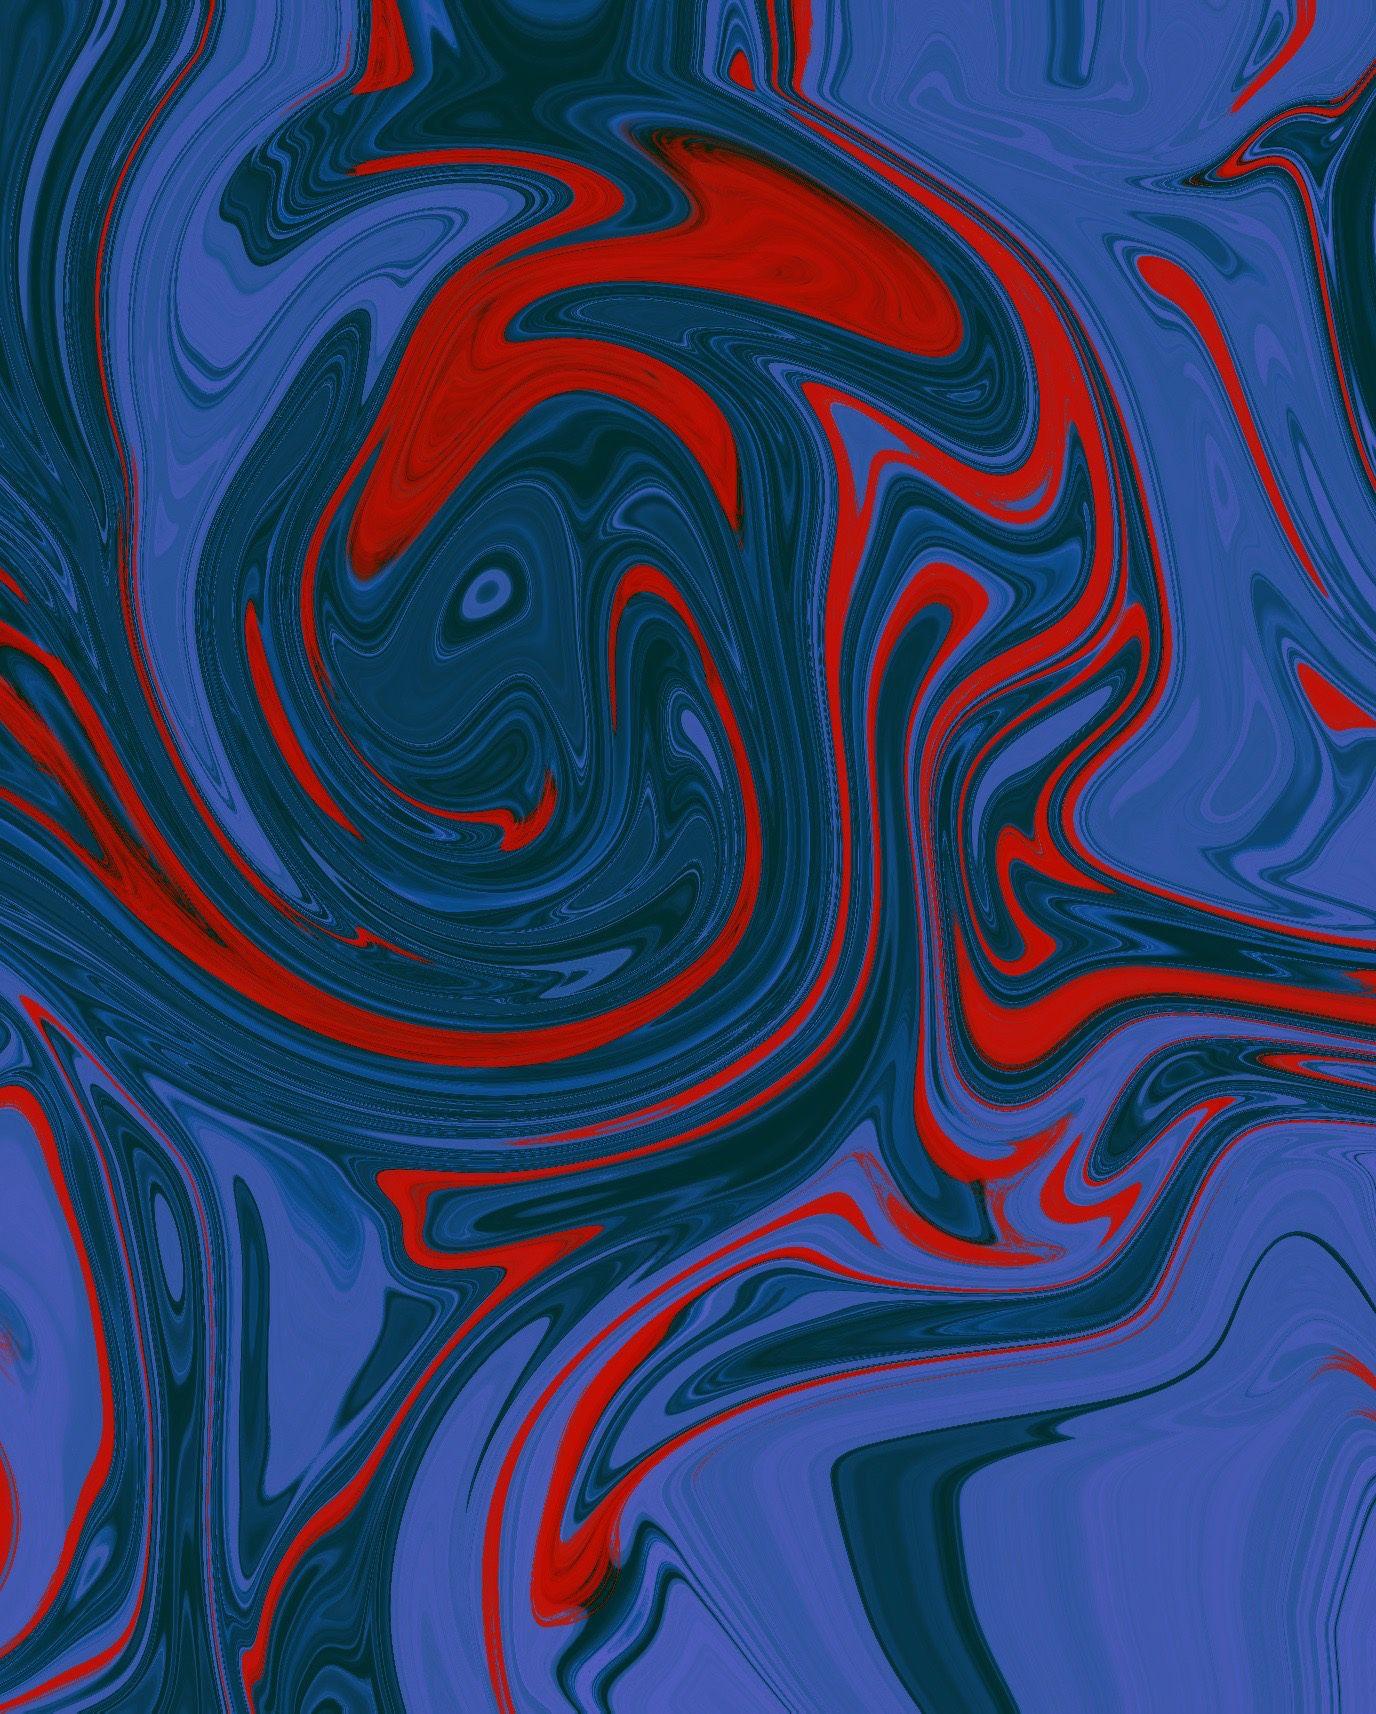 4k Liquid Pattern Creative Wallpaper Abstract Abstract Artwork Blue Abstract 4k wallpaper blue and red